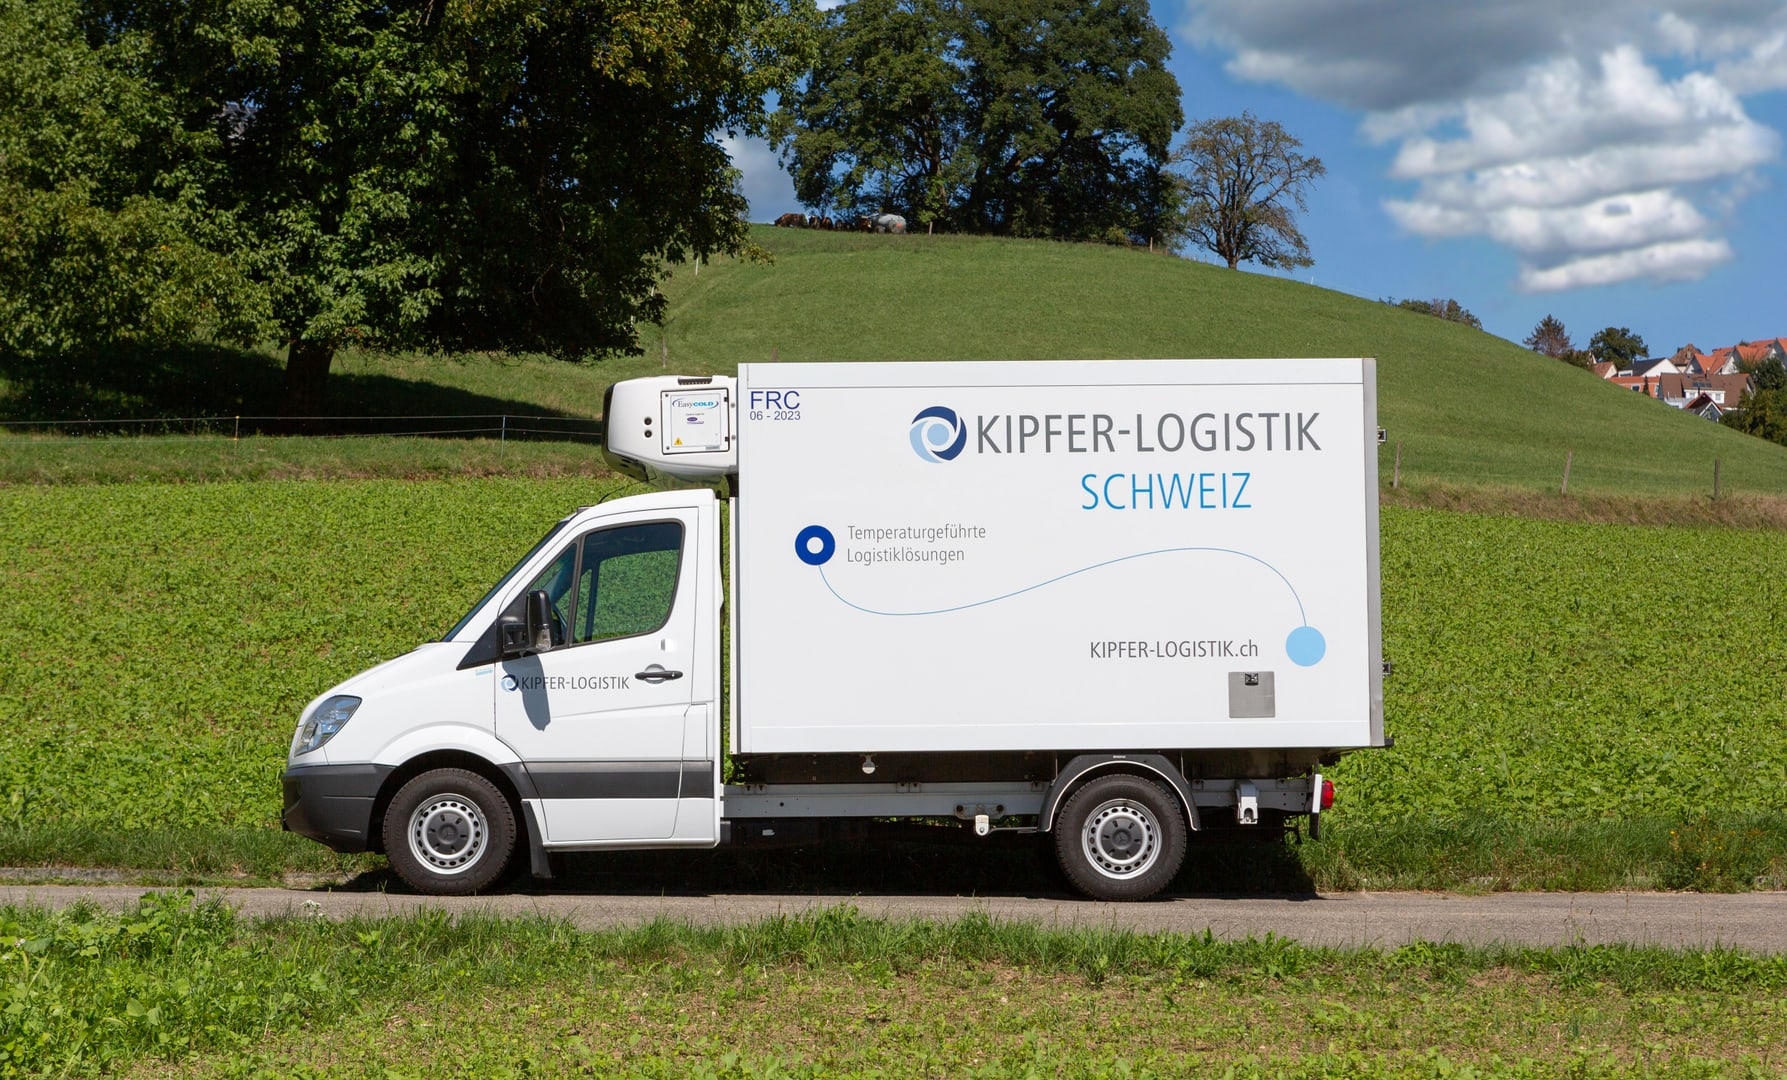 Pharma-Sprinter | Kipfer-Logistik Schweiz